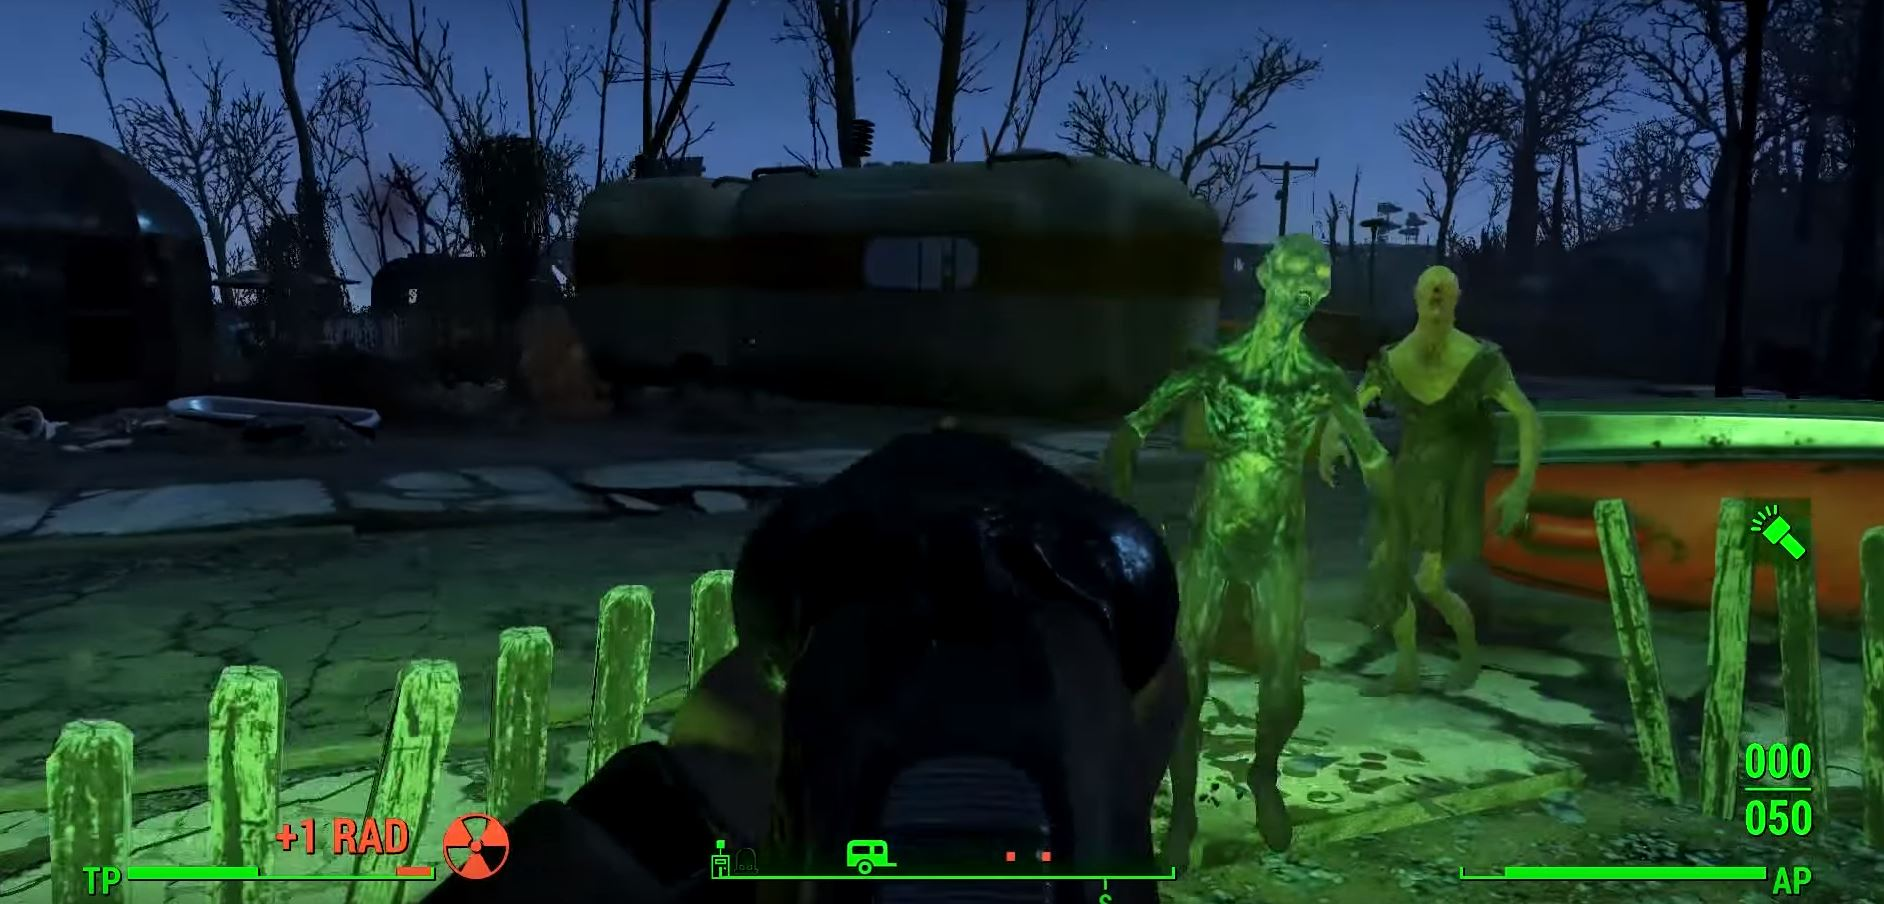 Fallout 4 Kreaturen Im Odland Update Far Harbor Giga